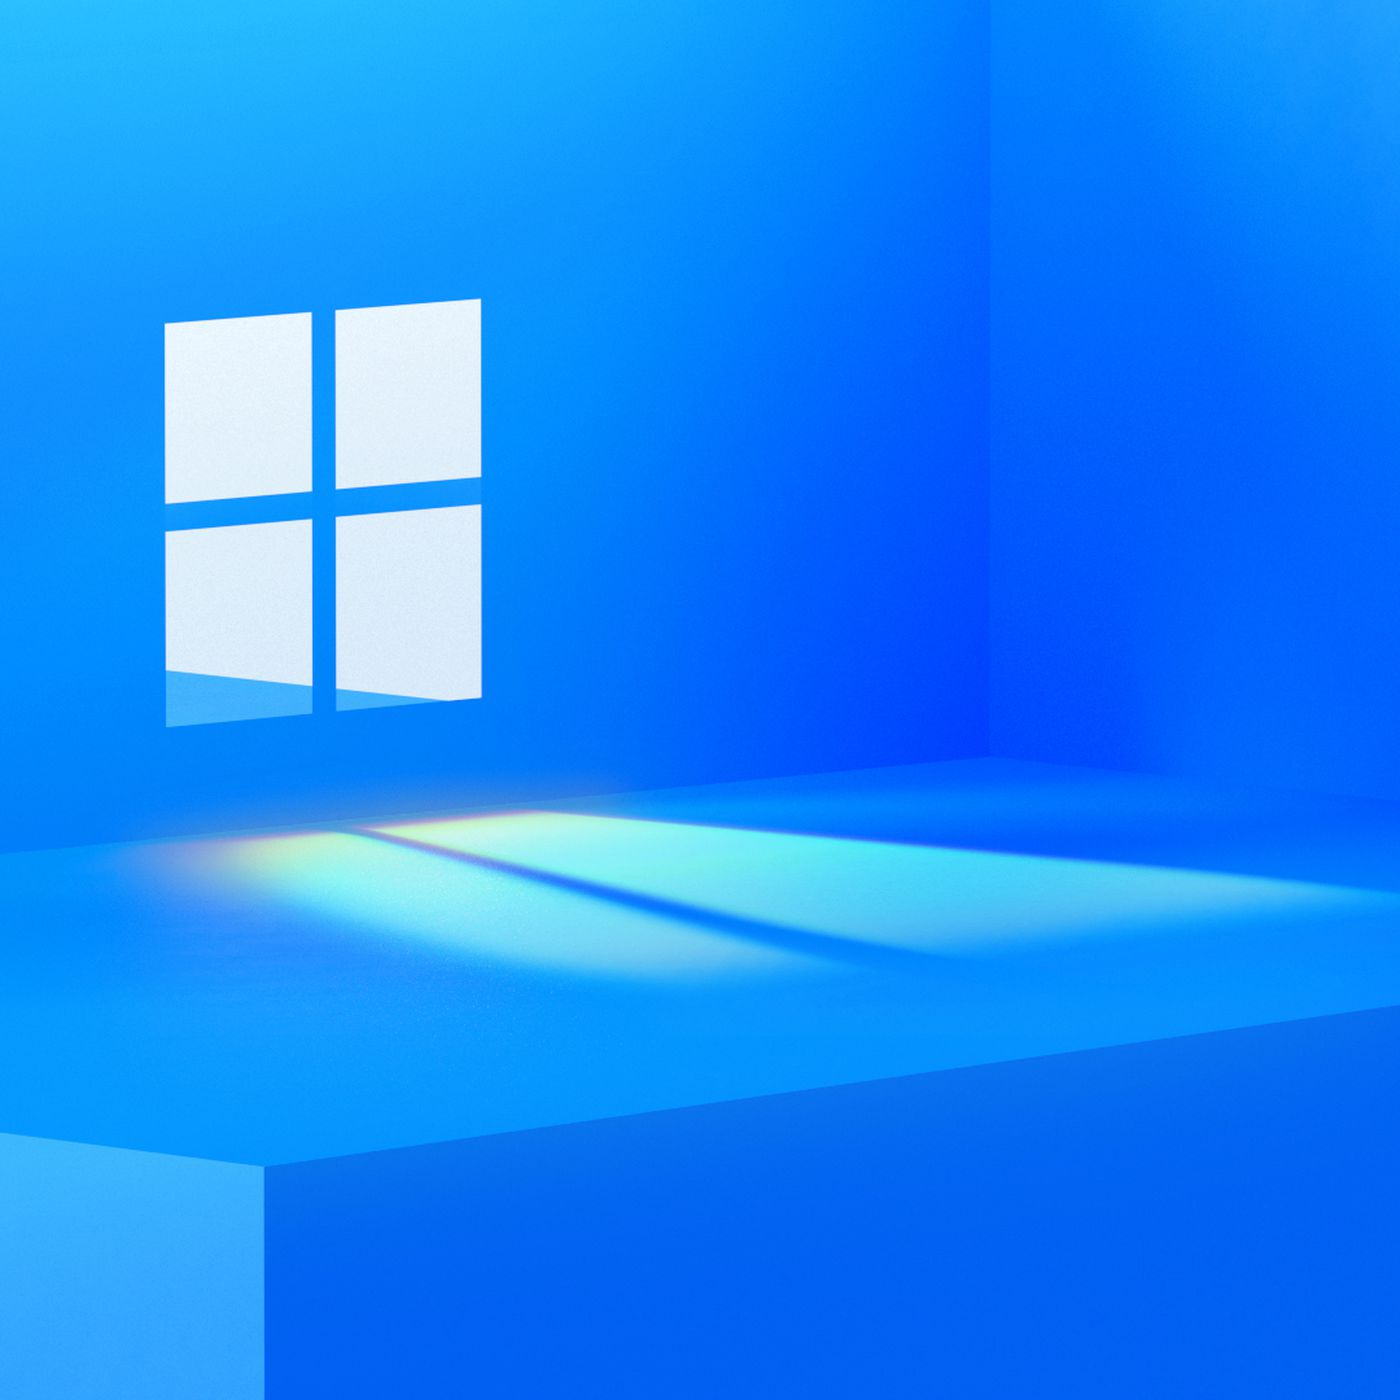 Microsoft looks ready to launch Windows 11 - The Verge